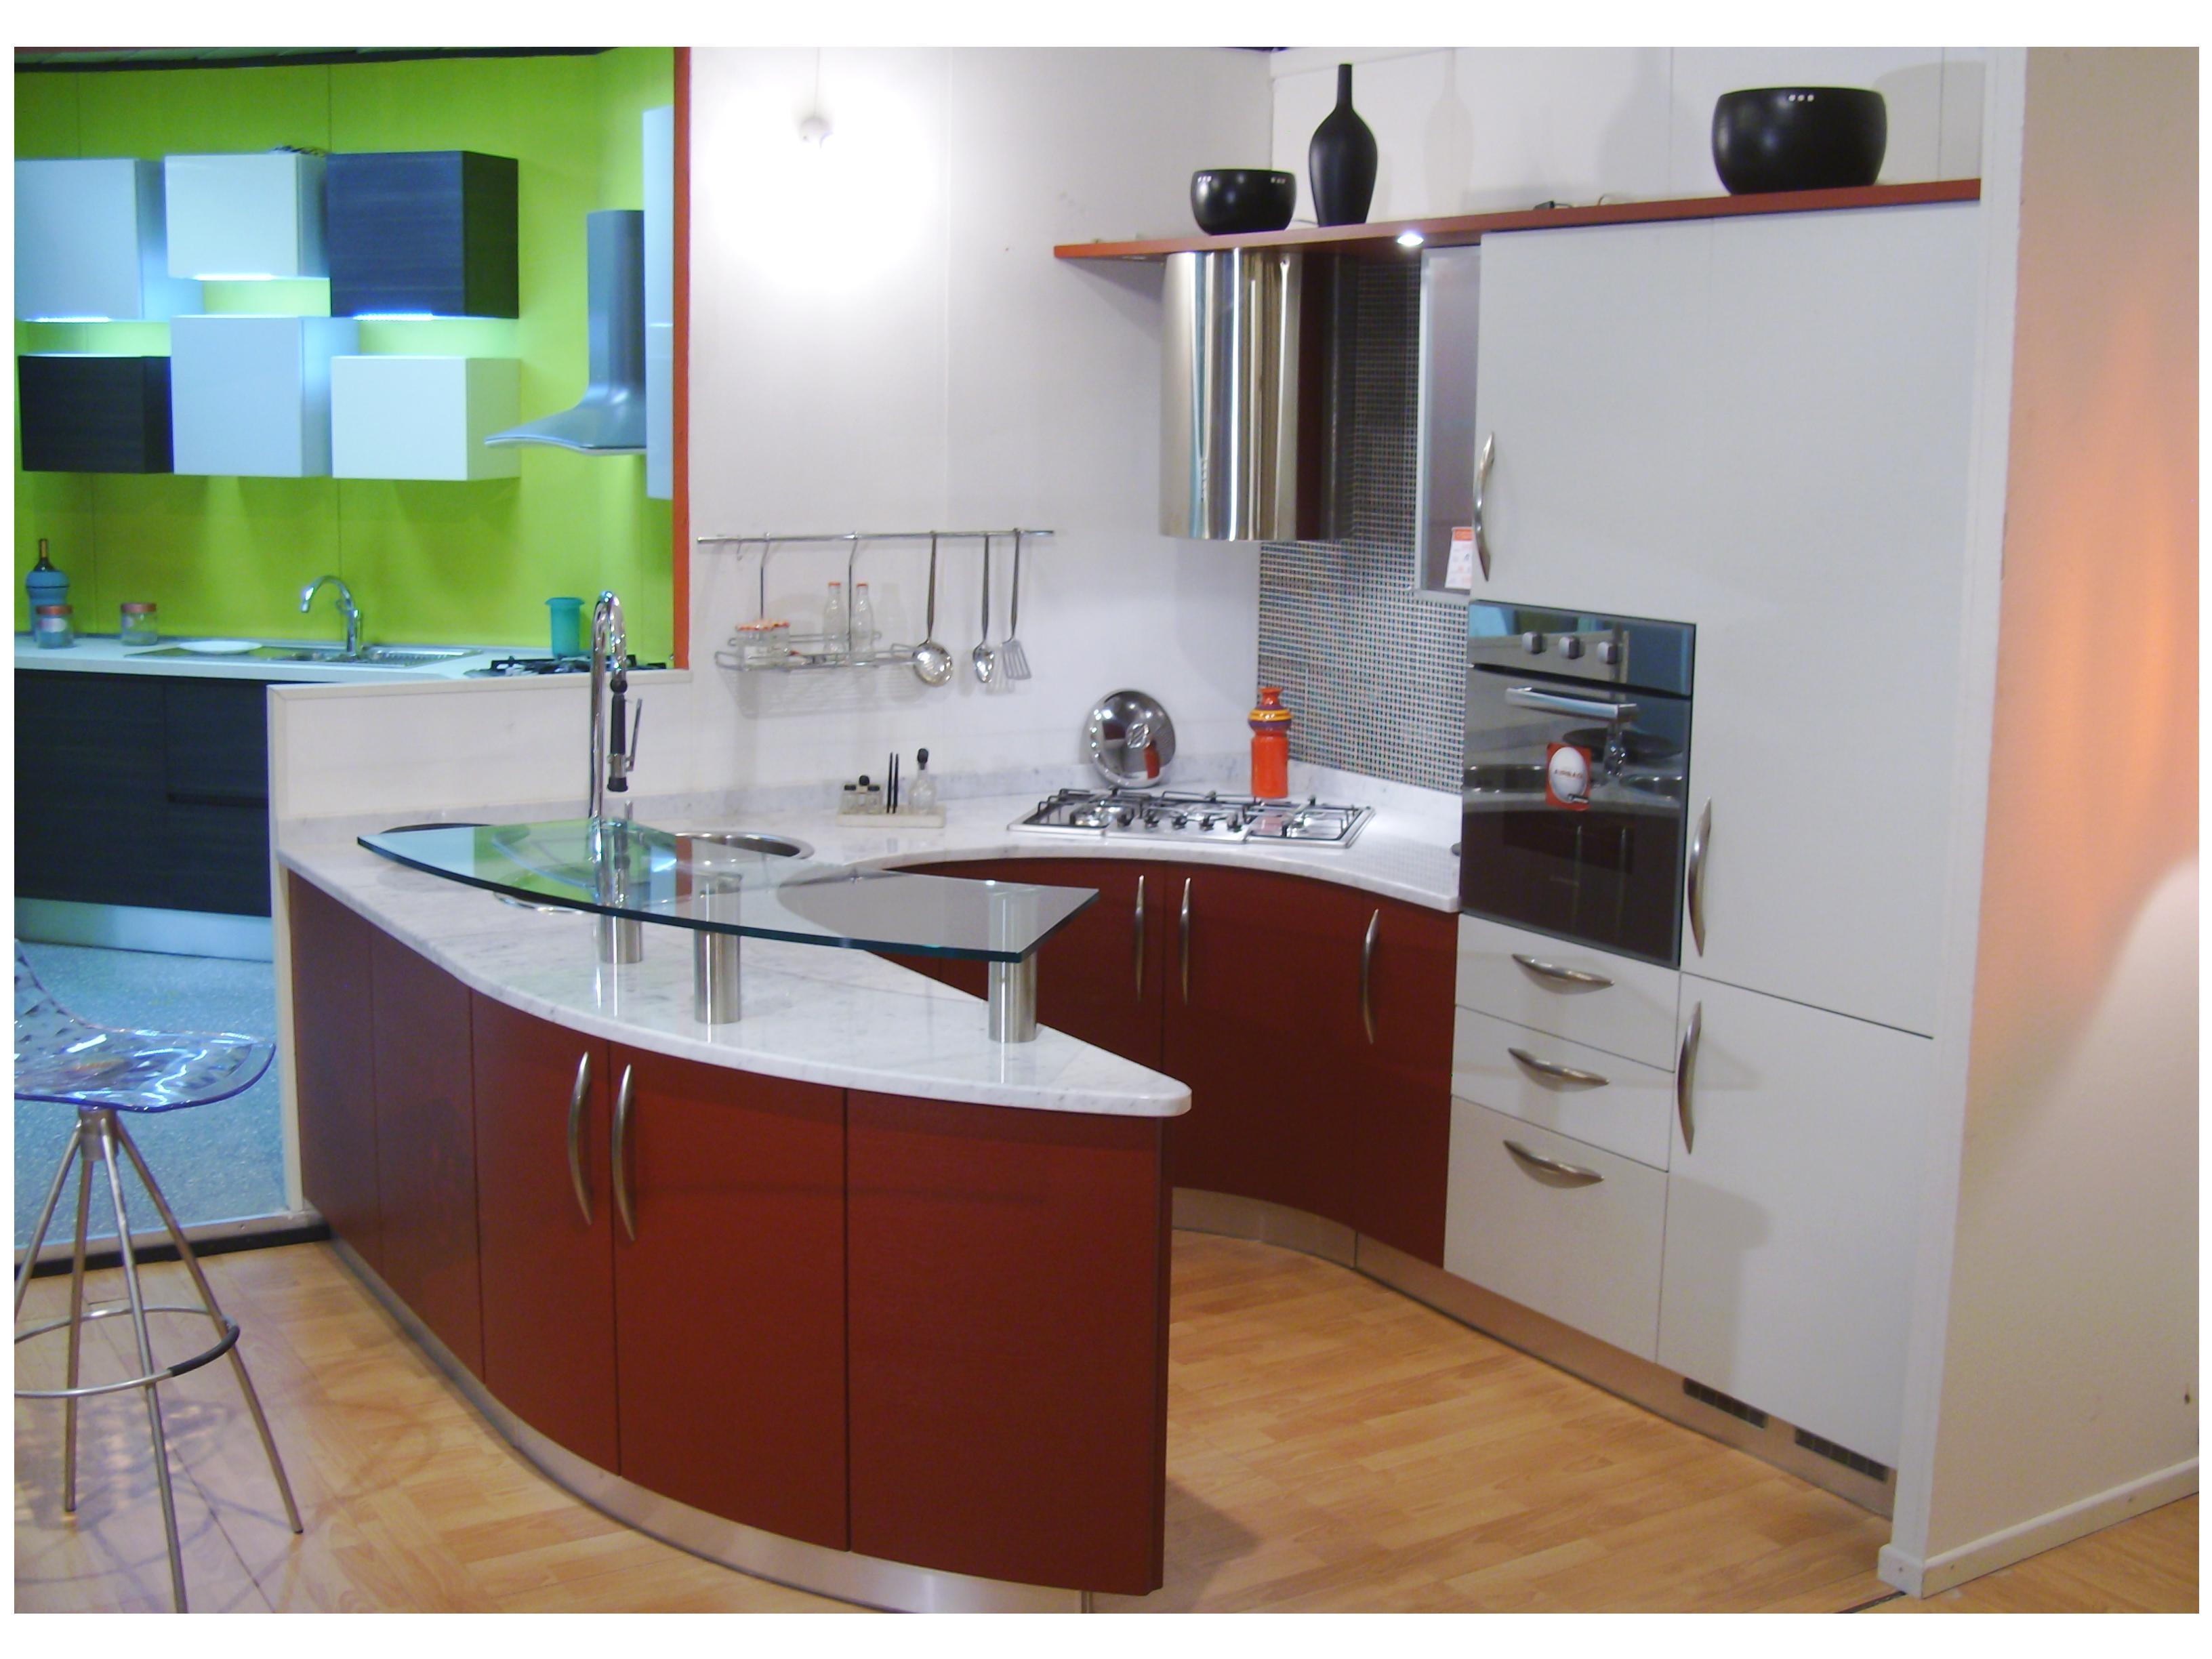 Cucine tonde excellent vito sgabello in metallo con for Isola cucina circolare